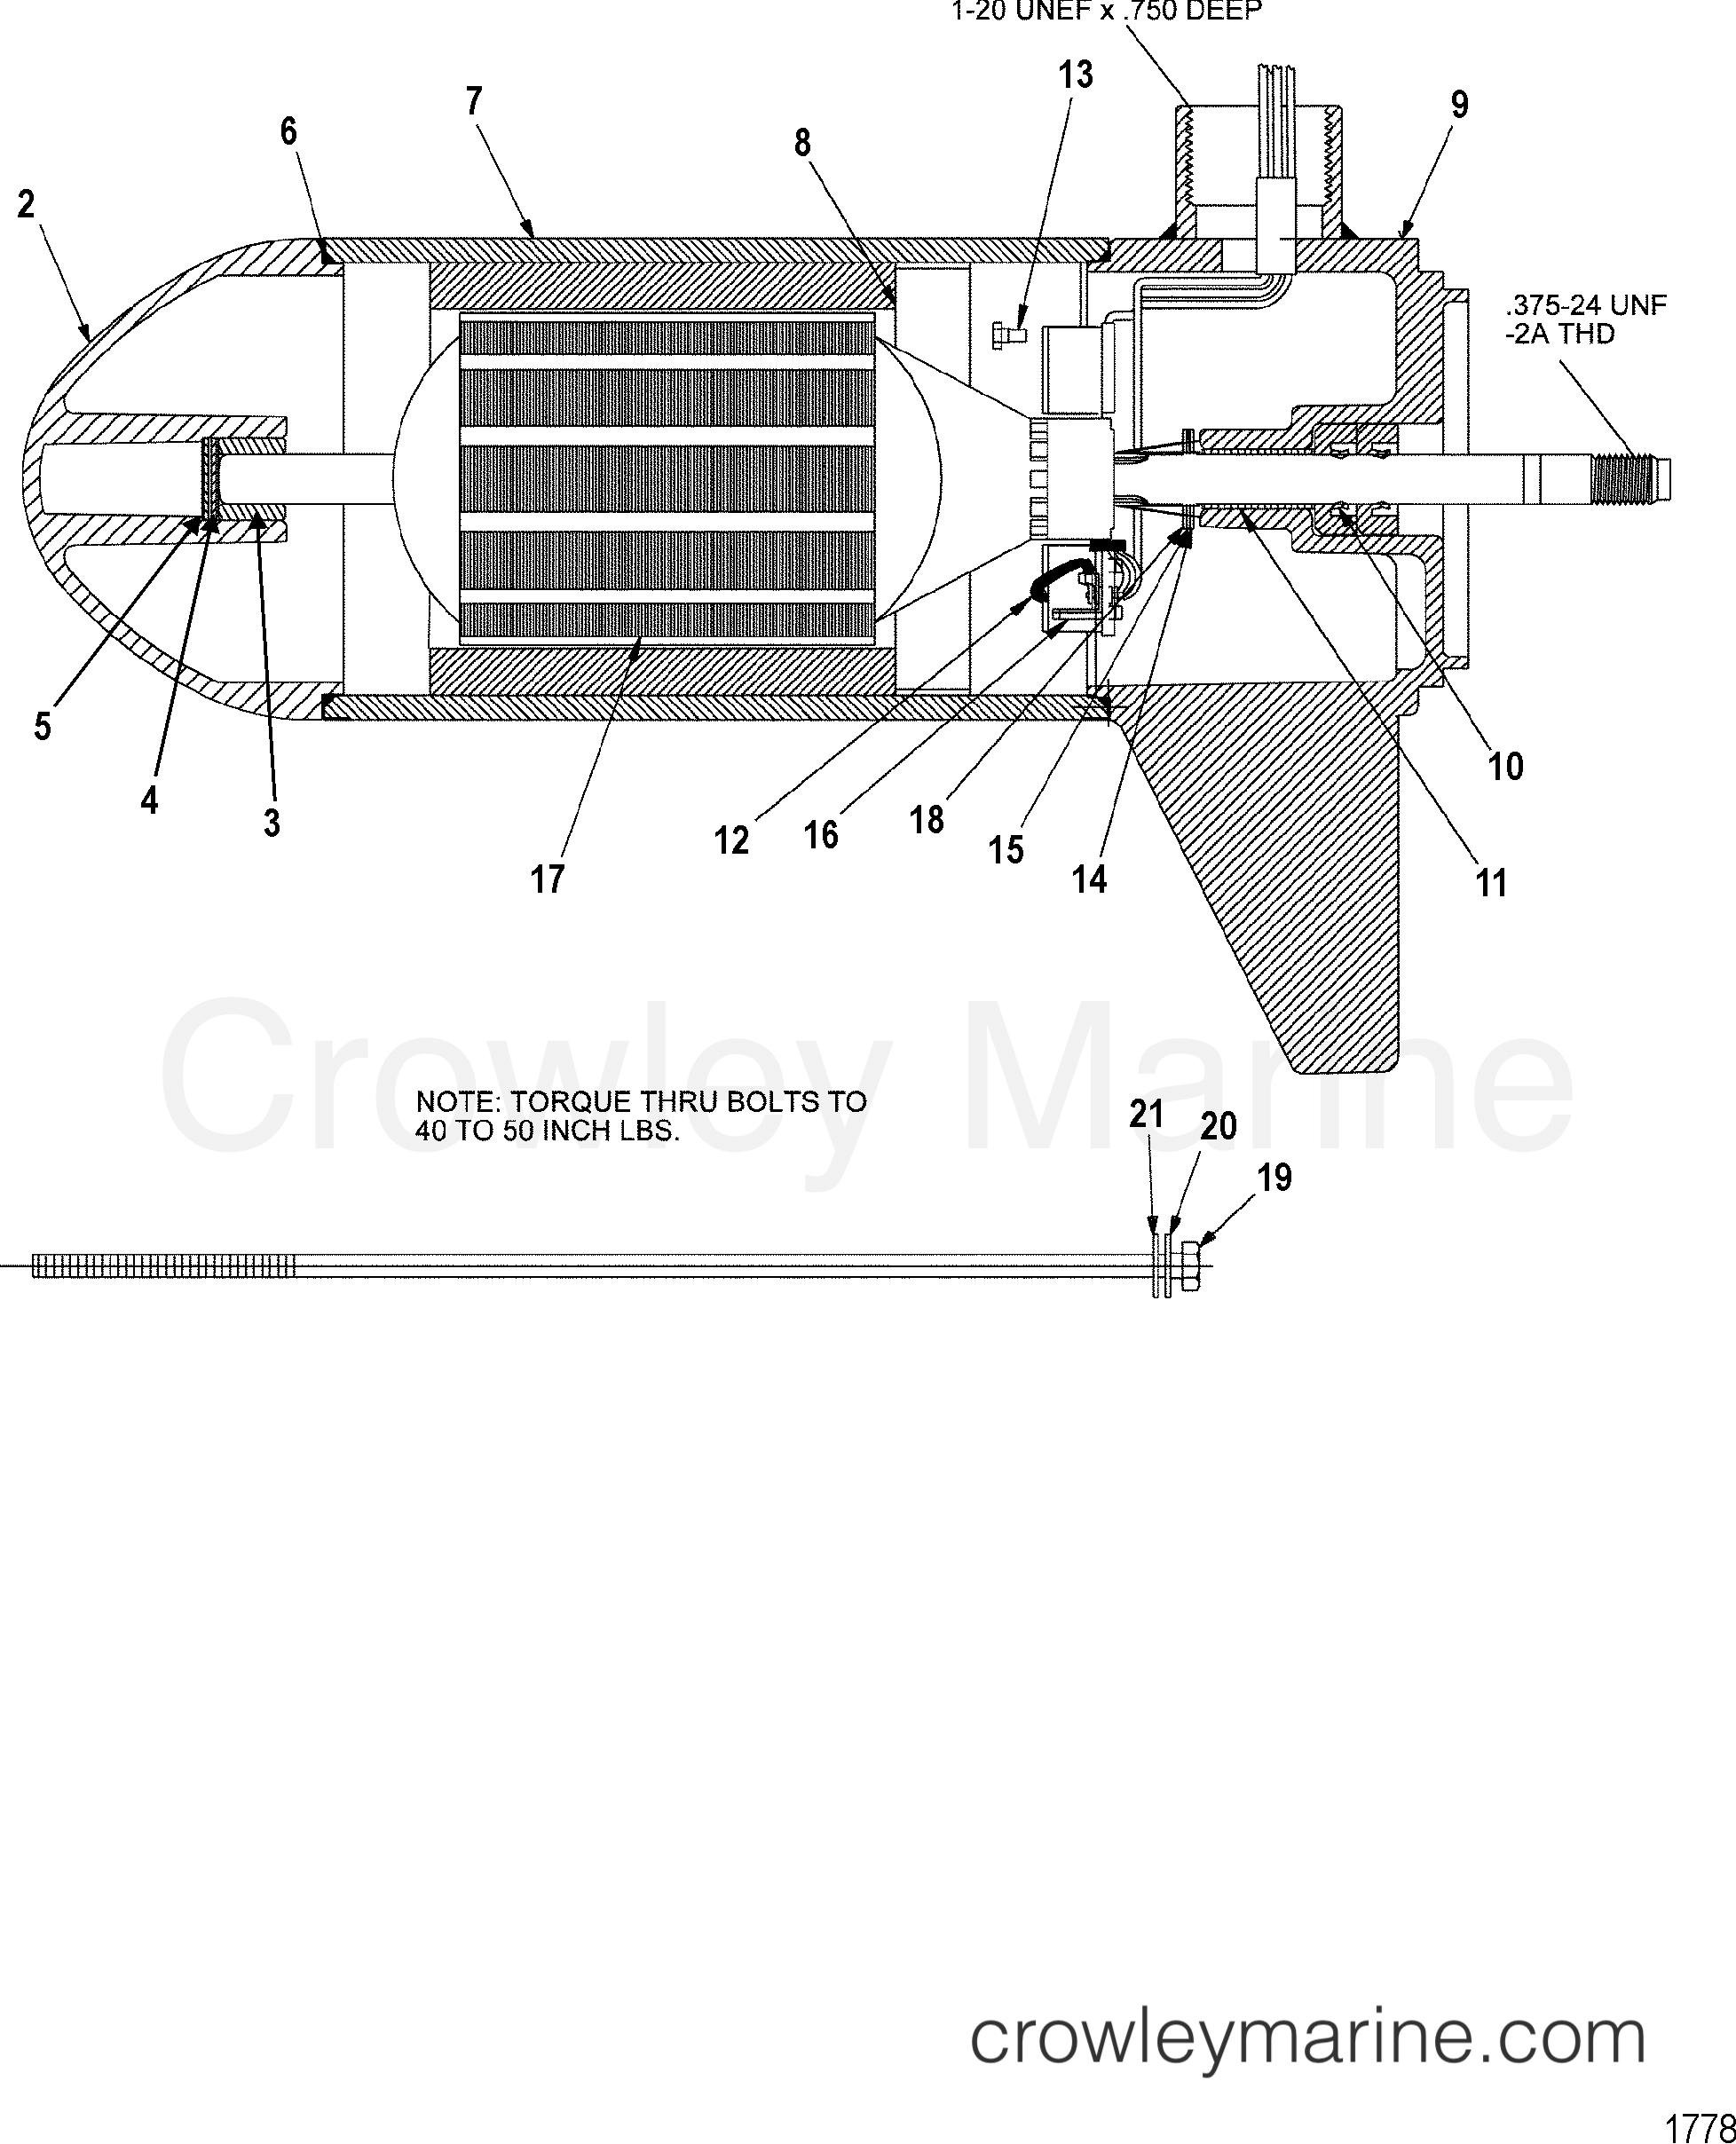 2002 MotorGuide 12V [MOTORGUIDE] - 9EF37B7ZJ LOWER UNIT ASSEMBLY(35# - 5 SPEED) (MSM397052) section